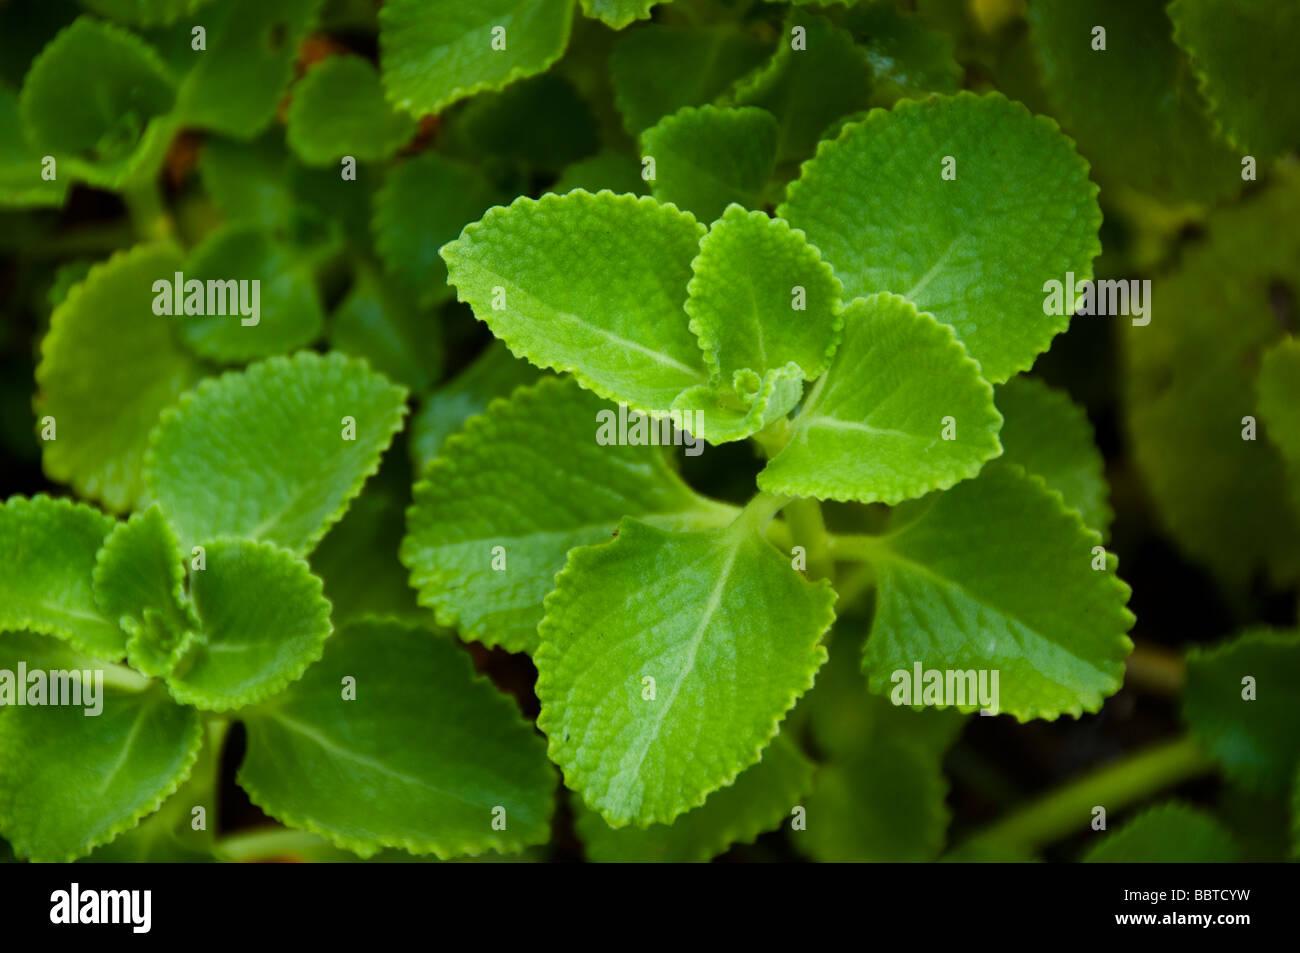 Piante medicinali Paese indiano borragine o Coleus amboinicus India Kerala Immagini Stock